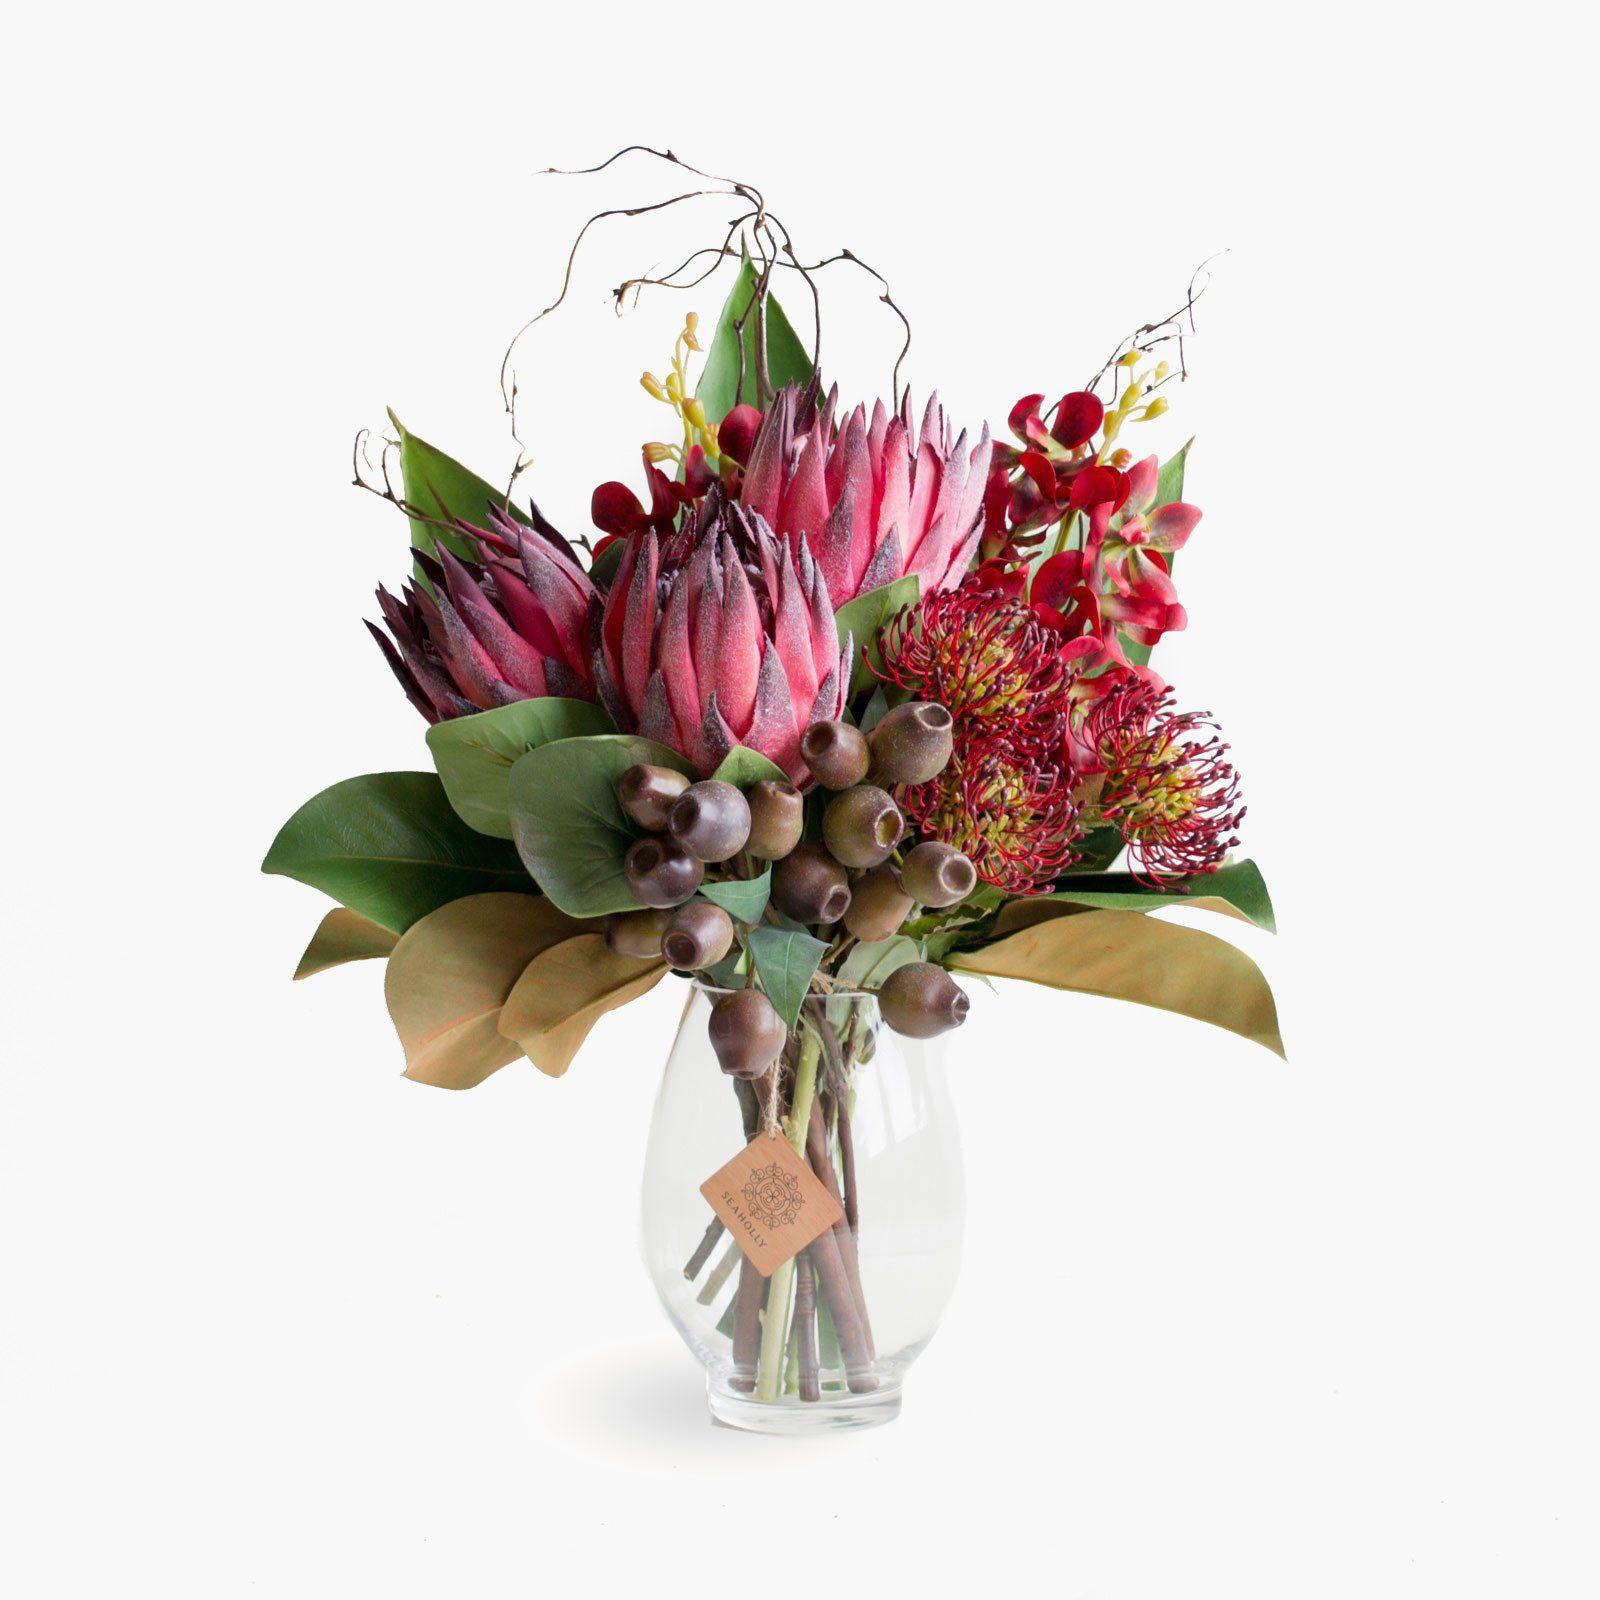 Burgundy King Protea Bottlebrush Pods And Gum Nuts Large Protea Flower Australian Native Flowers Flower Arrangements